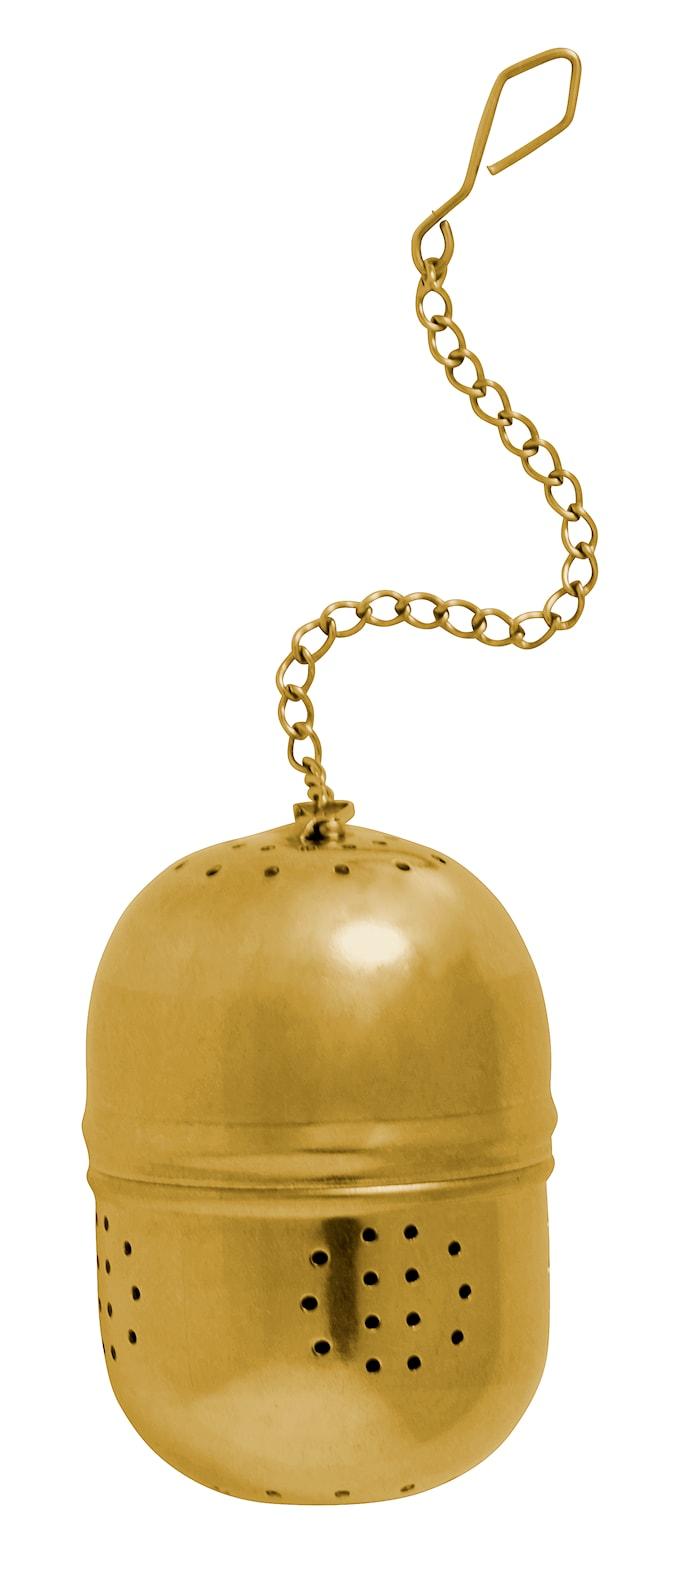 Te-kugle Ø 4 cm - Guld